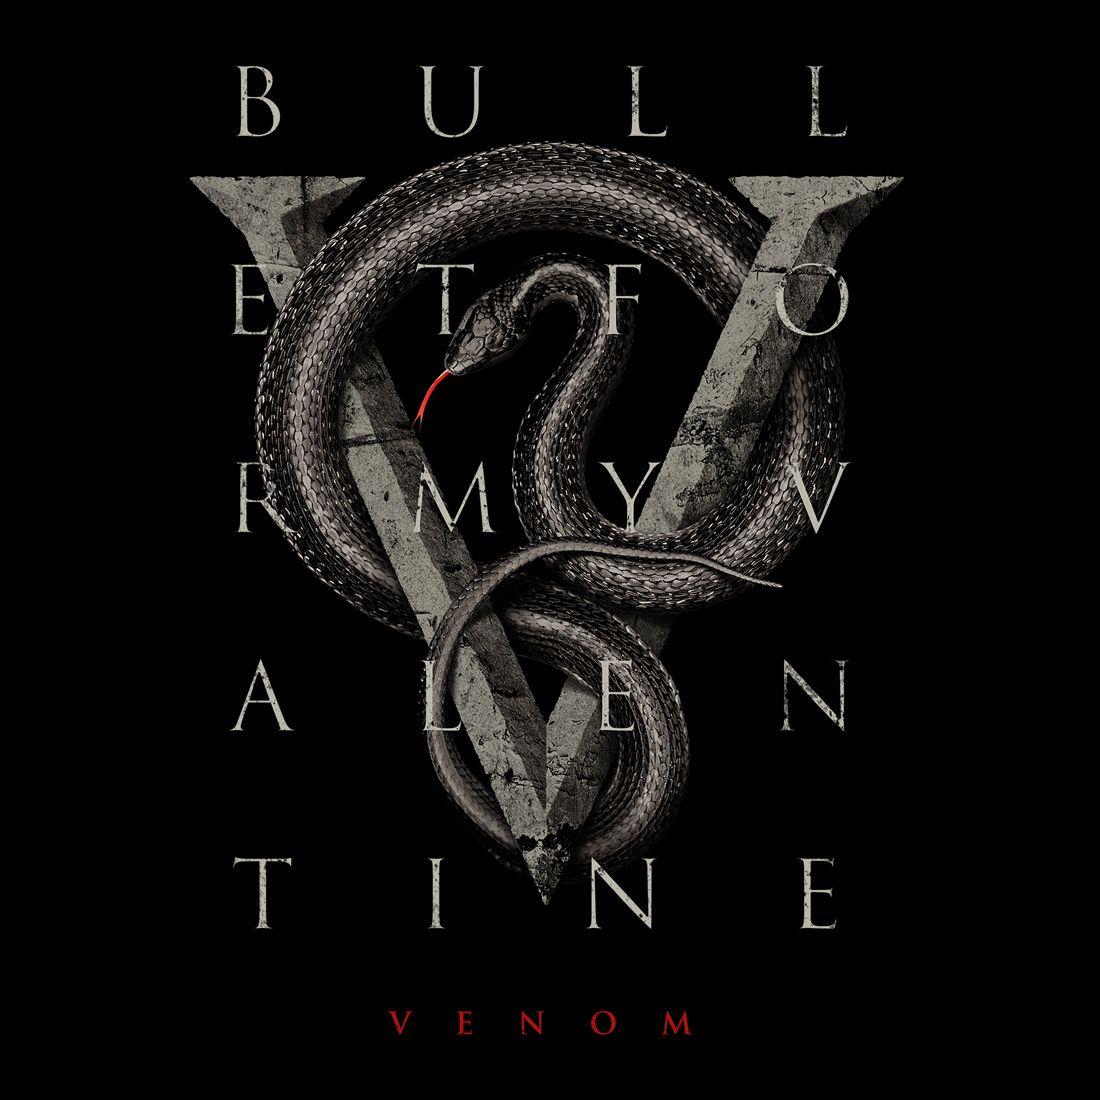 Bullet For My Valentine 2015 Venom